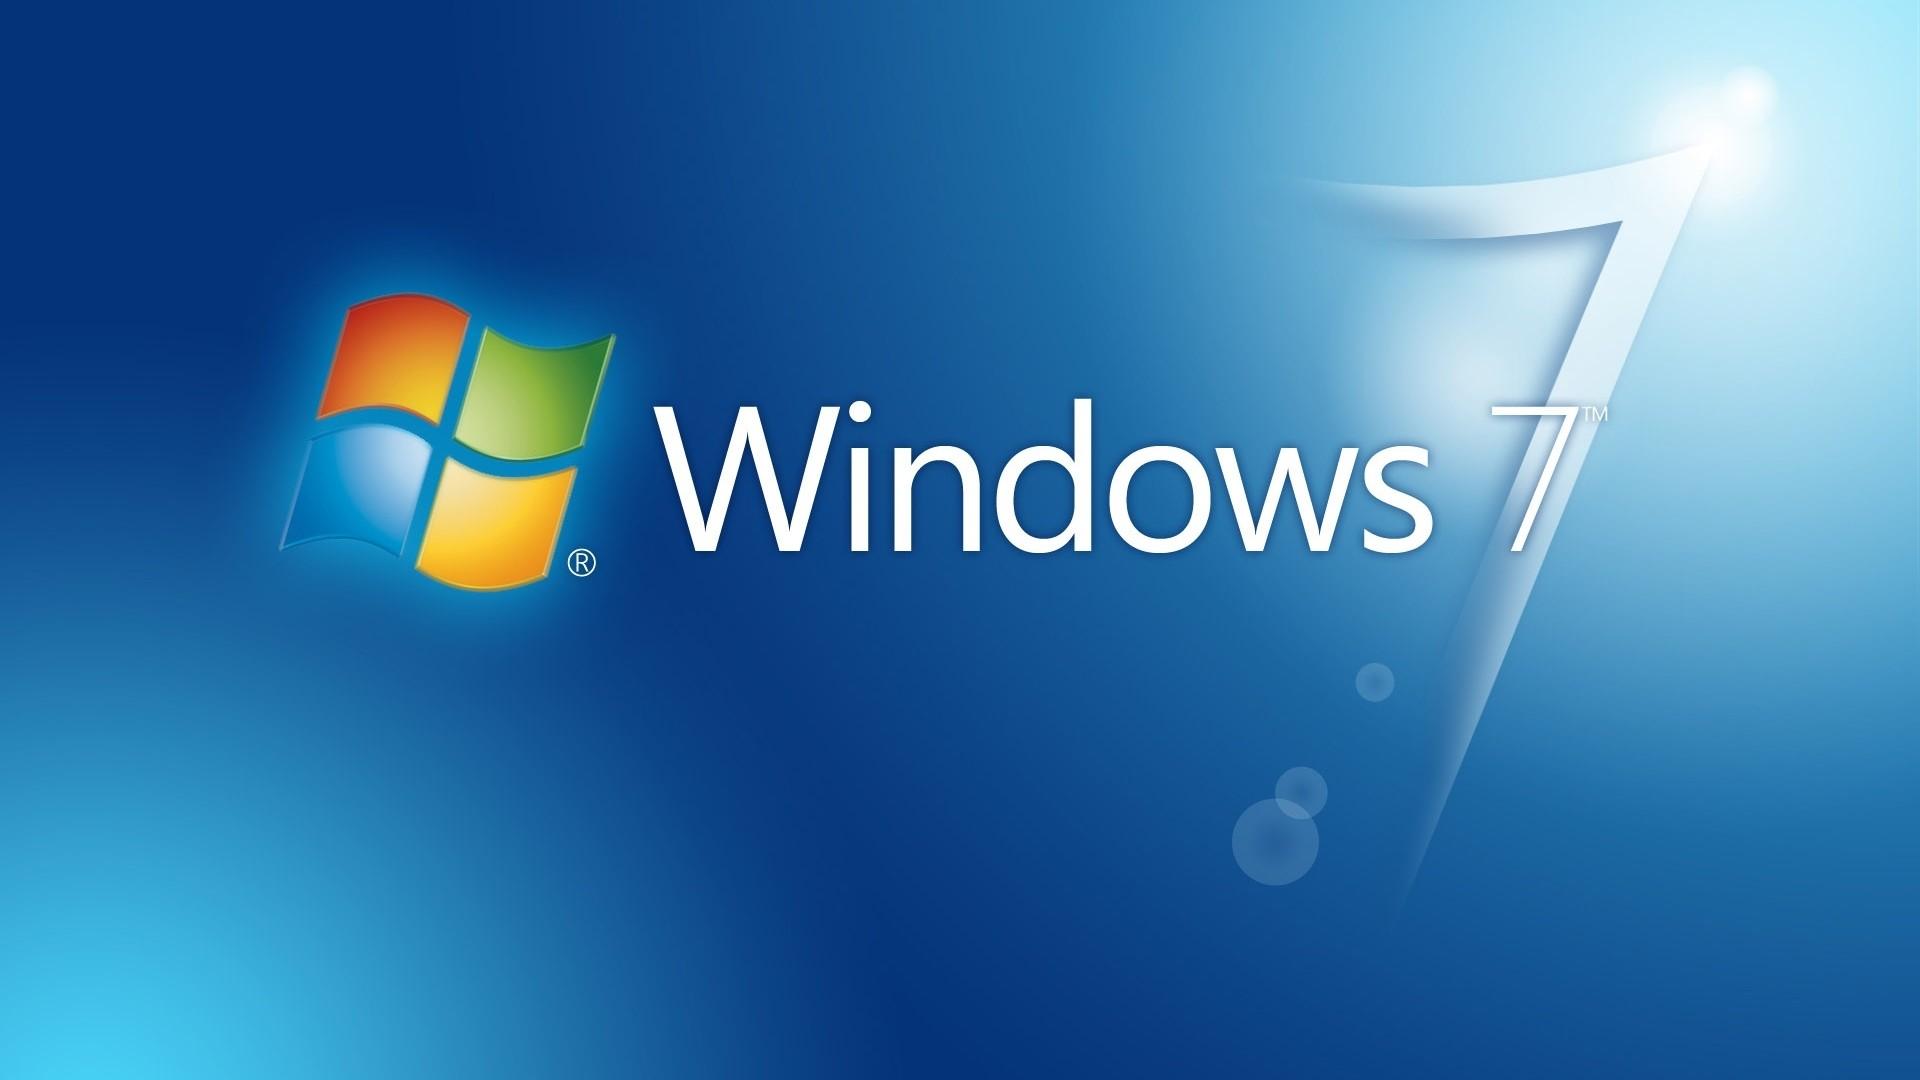 Windows 7 Desktop Wallpapers ·① WallpaperTag